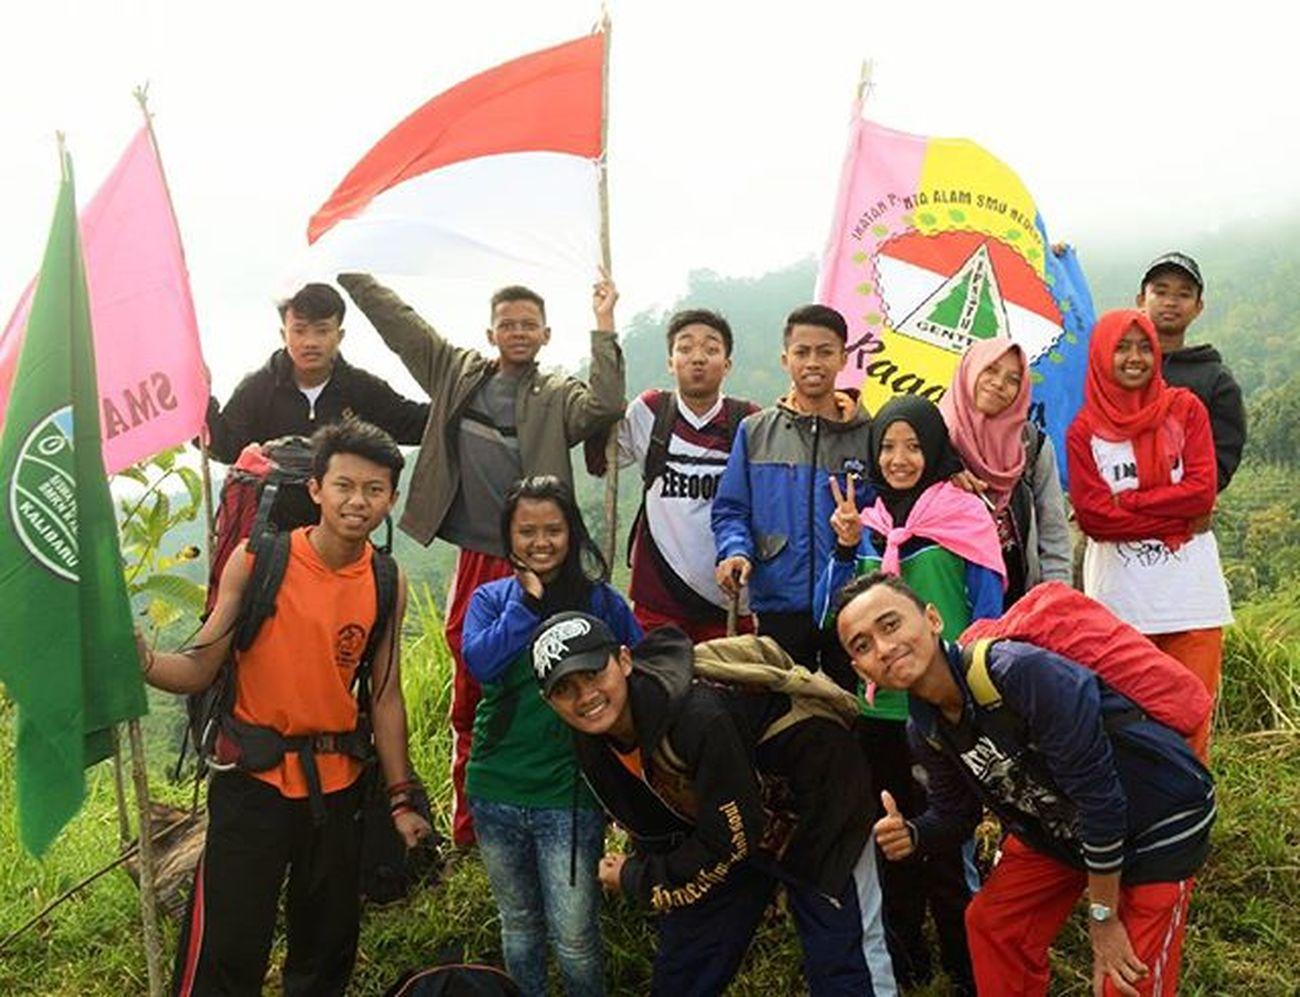 Brangkat lagi yok MT Menyan 17 Agustus 2015 Adventure Kemerdekaan Hiking Penikmatkaryatuhan Banyuwangi Explorebanyuwangi Pecintaalam Mountain